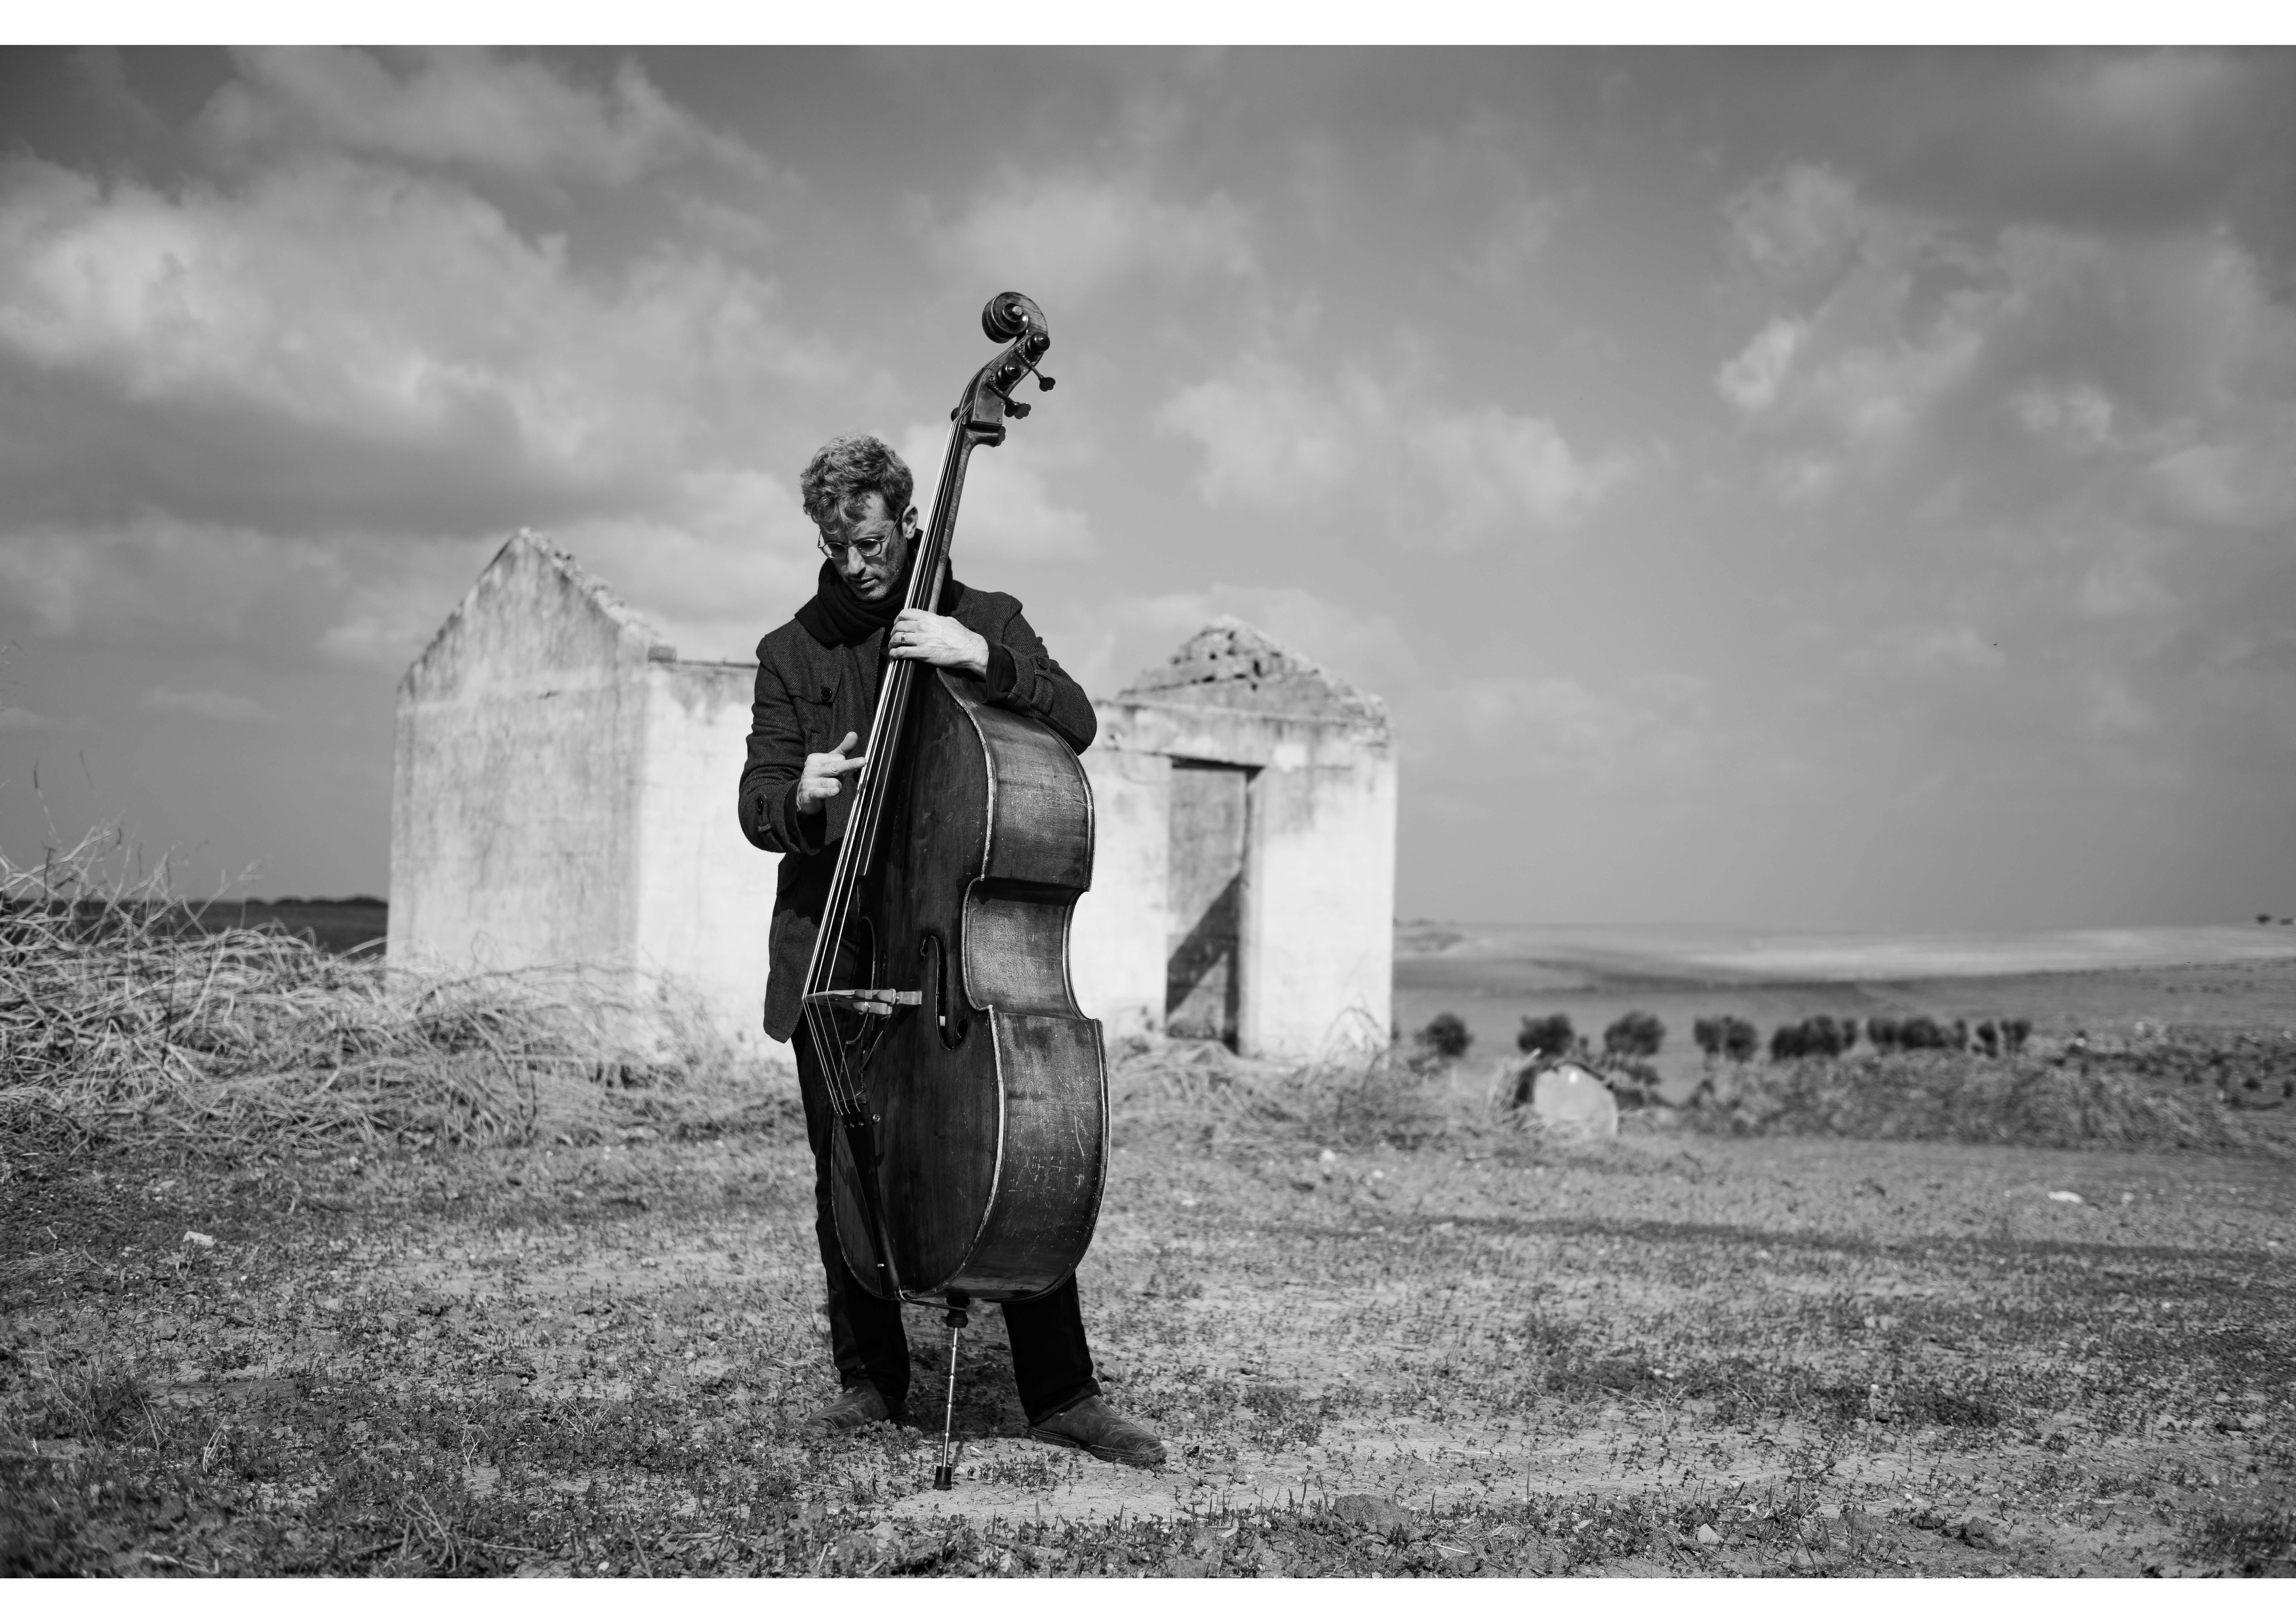 Tal Gamlieli Trio